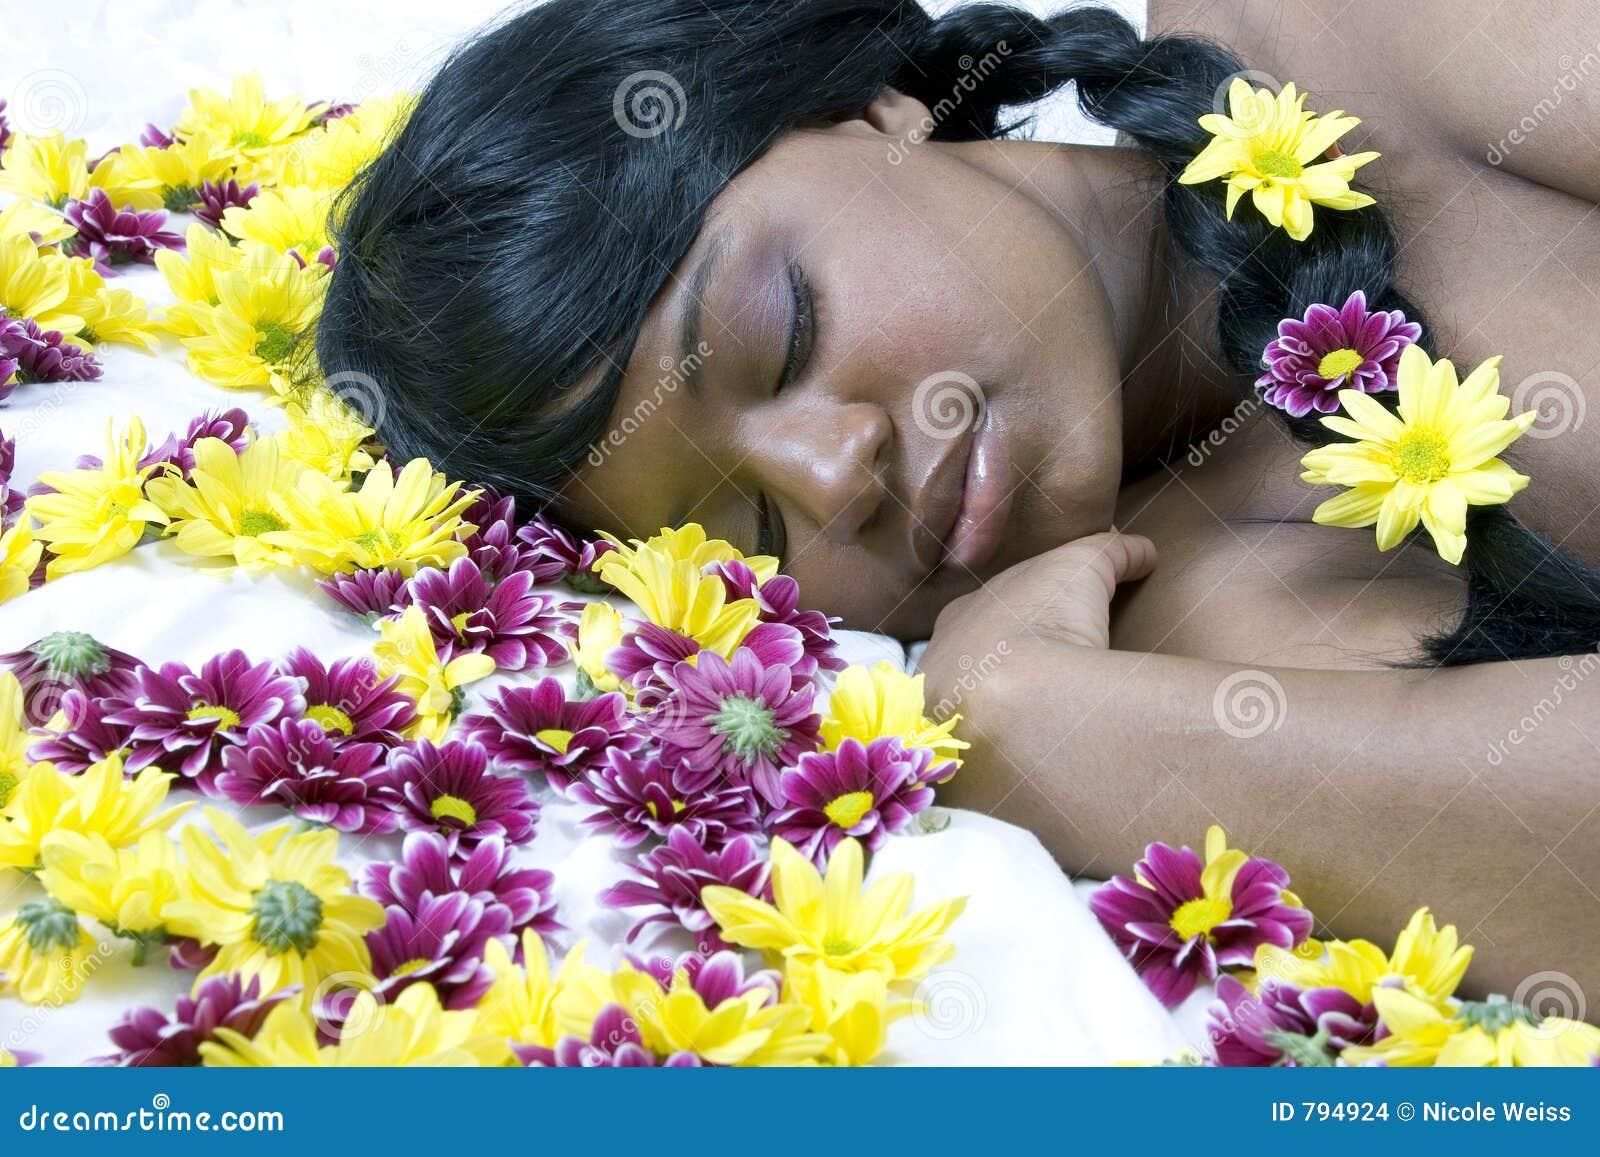 Sleeping beauty in a bed of flowers stock photo image of woman sleeping beauty in a bed of flowers izmirmasajfo